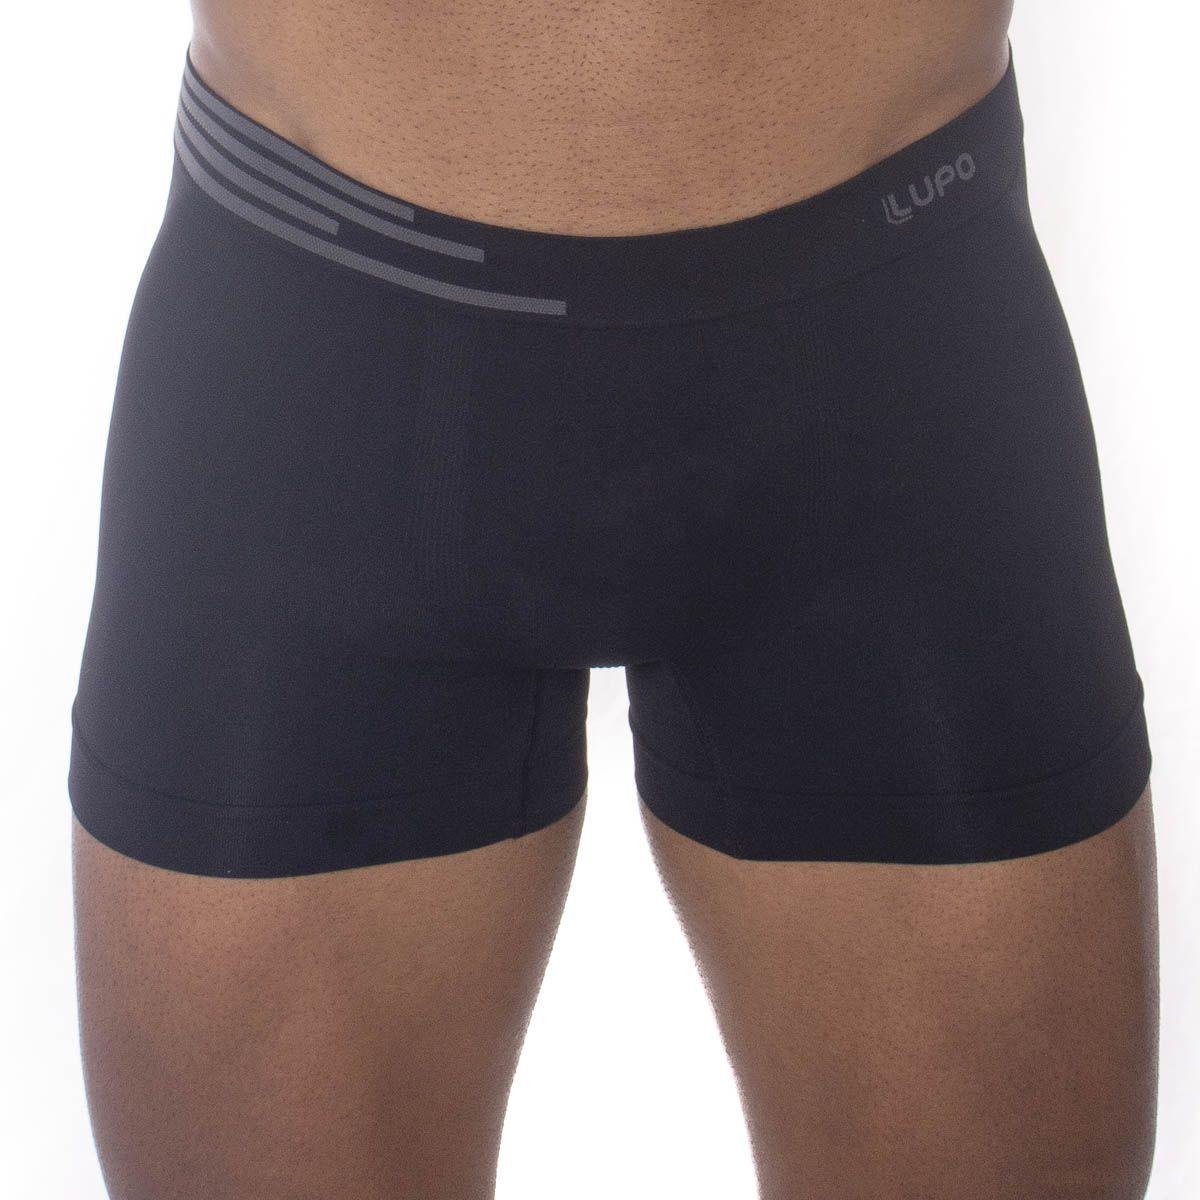 Cueca Boxer Lupo Sem Costura KIT 2 cuecas masculina adulto microfibra